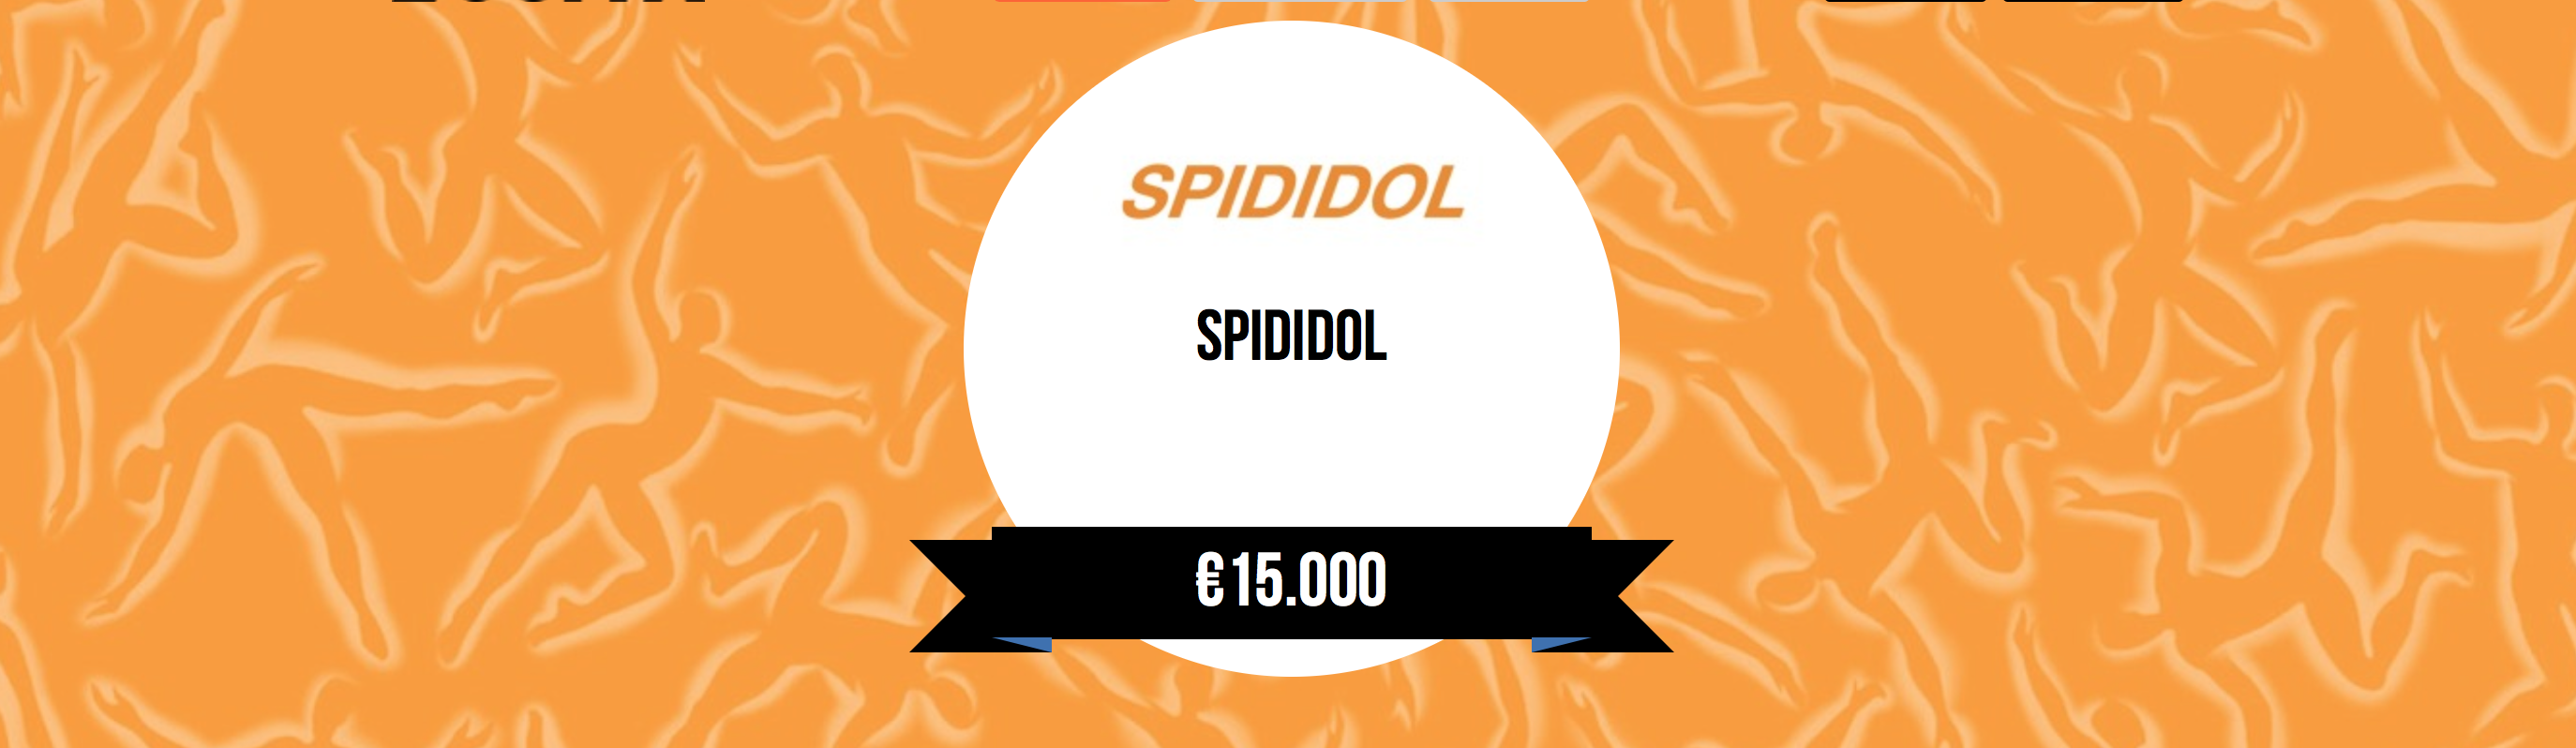 spididol_cover